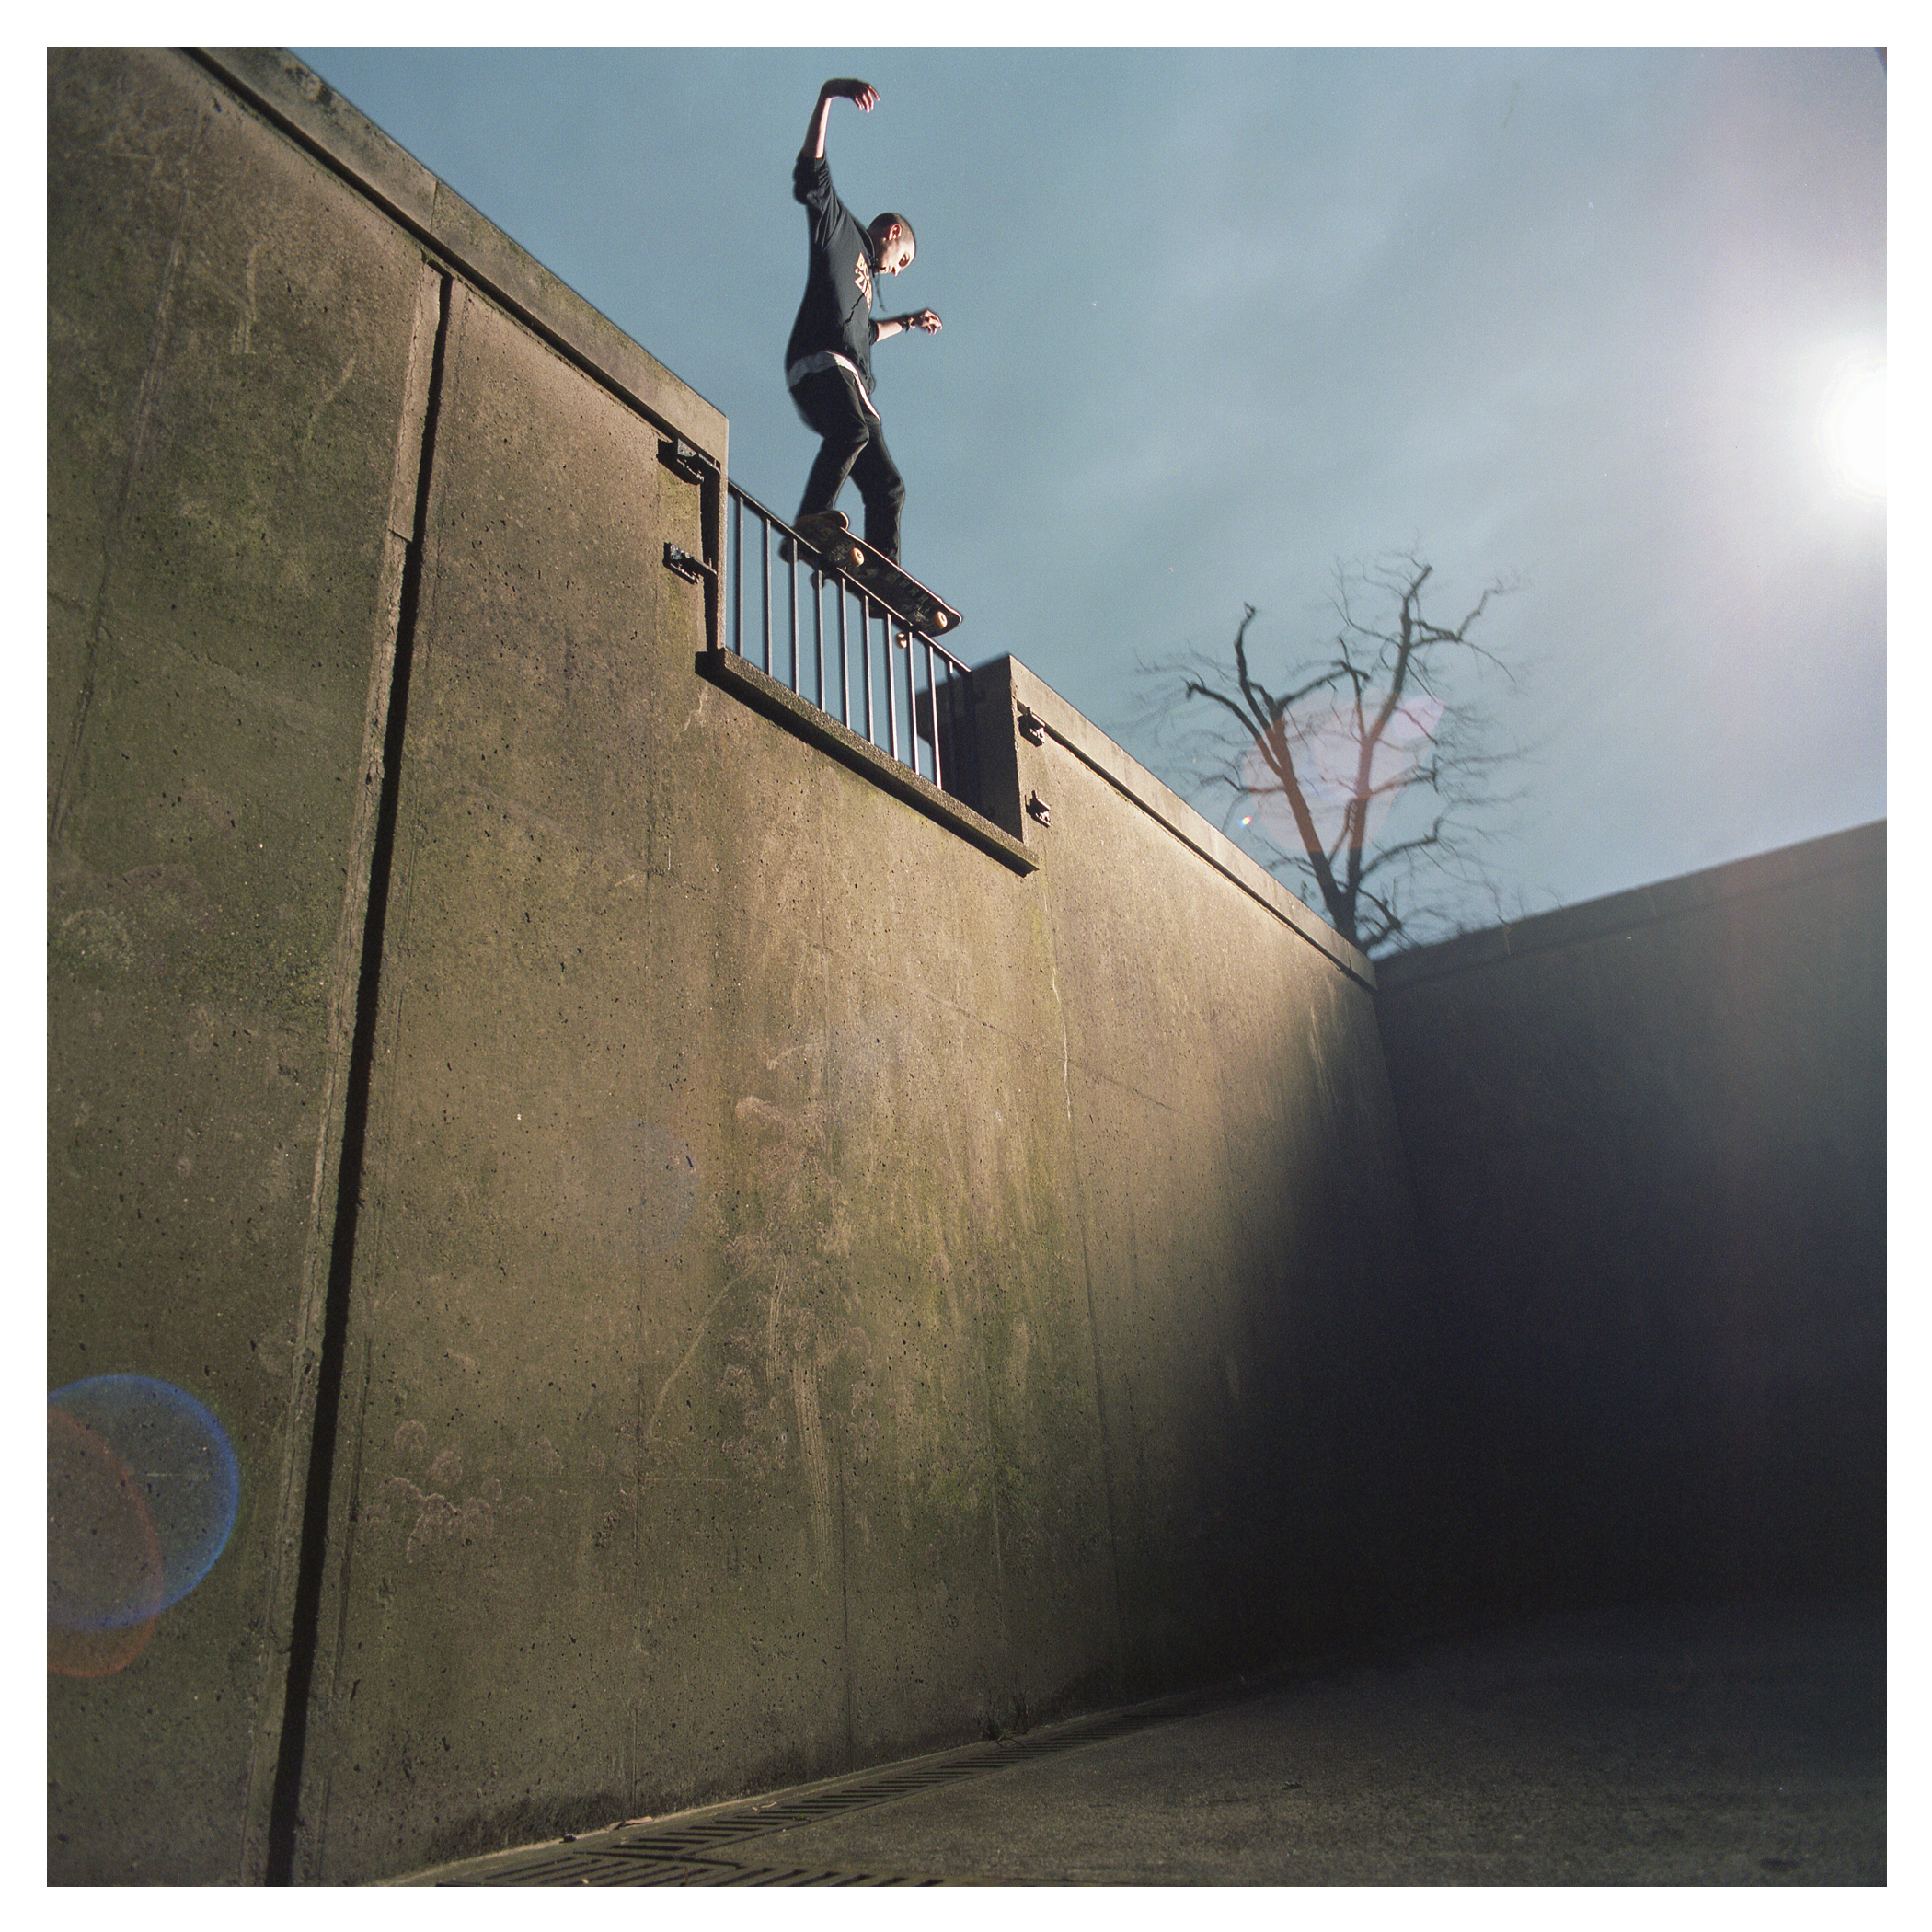 Jonny McConkey roll on 5050 of death - Queens University.  Published in issue 190 of Sidewalk for 'First Light - Jonny McConkey' article.